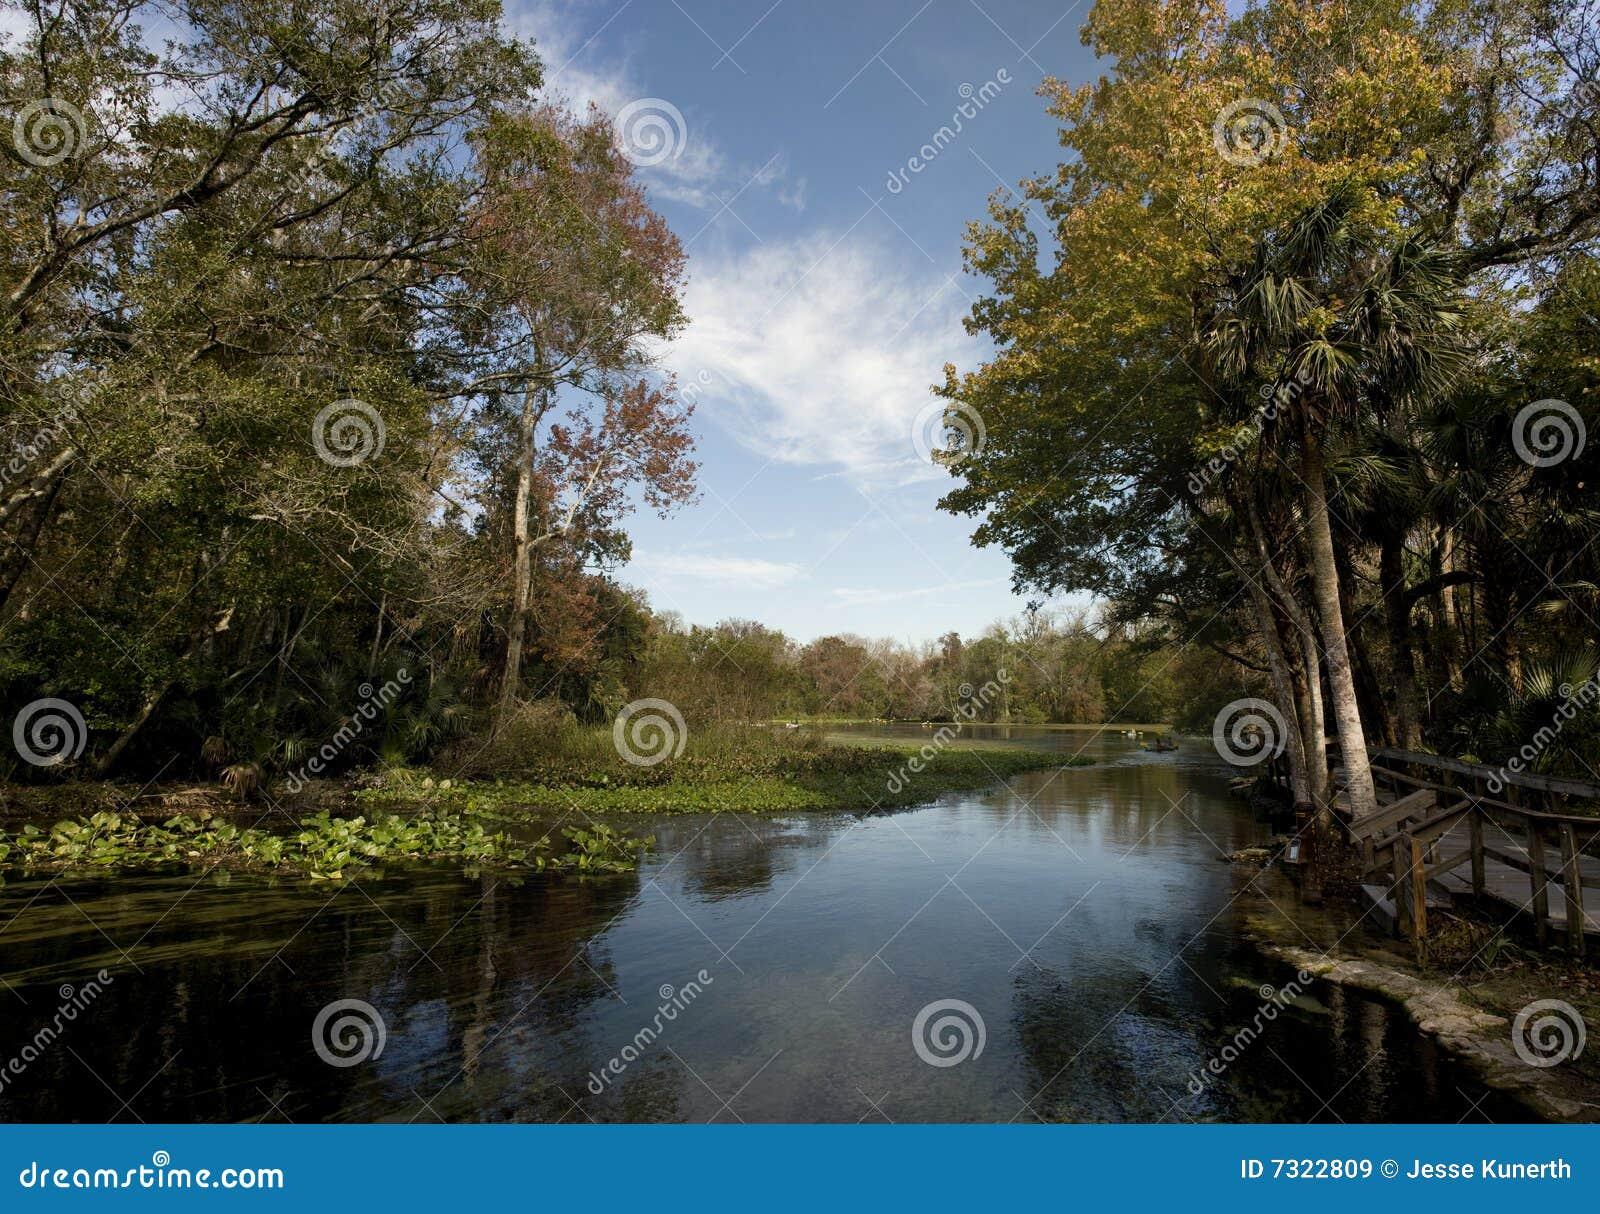 Wekiva Springs in Florida